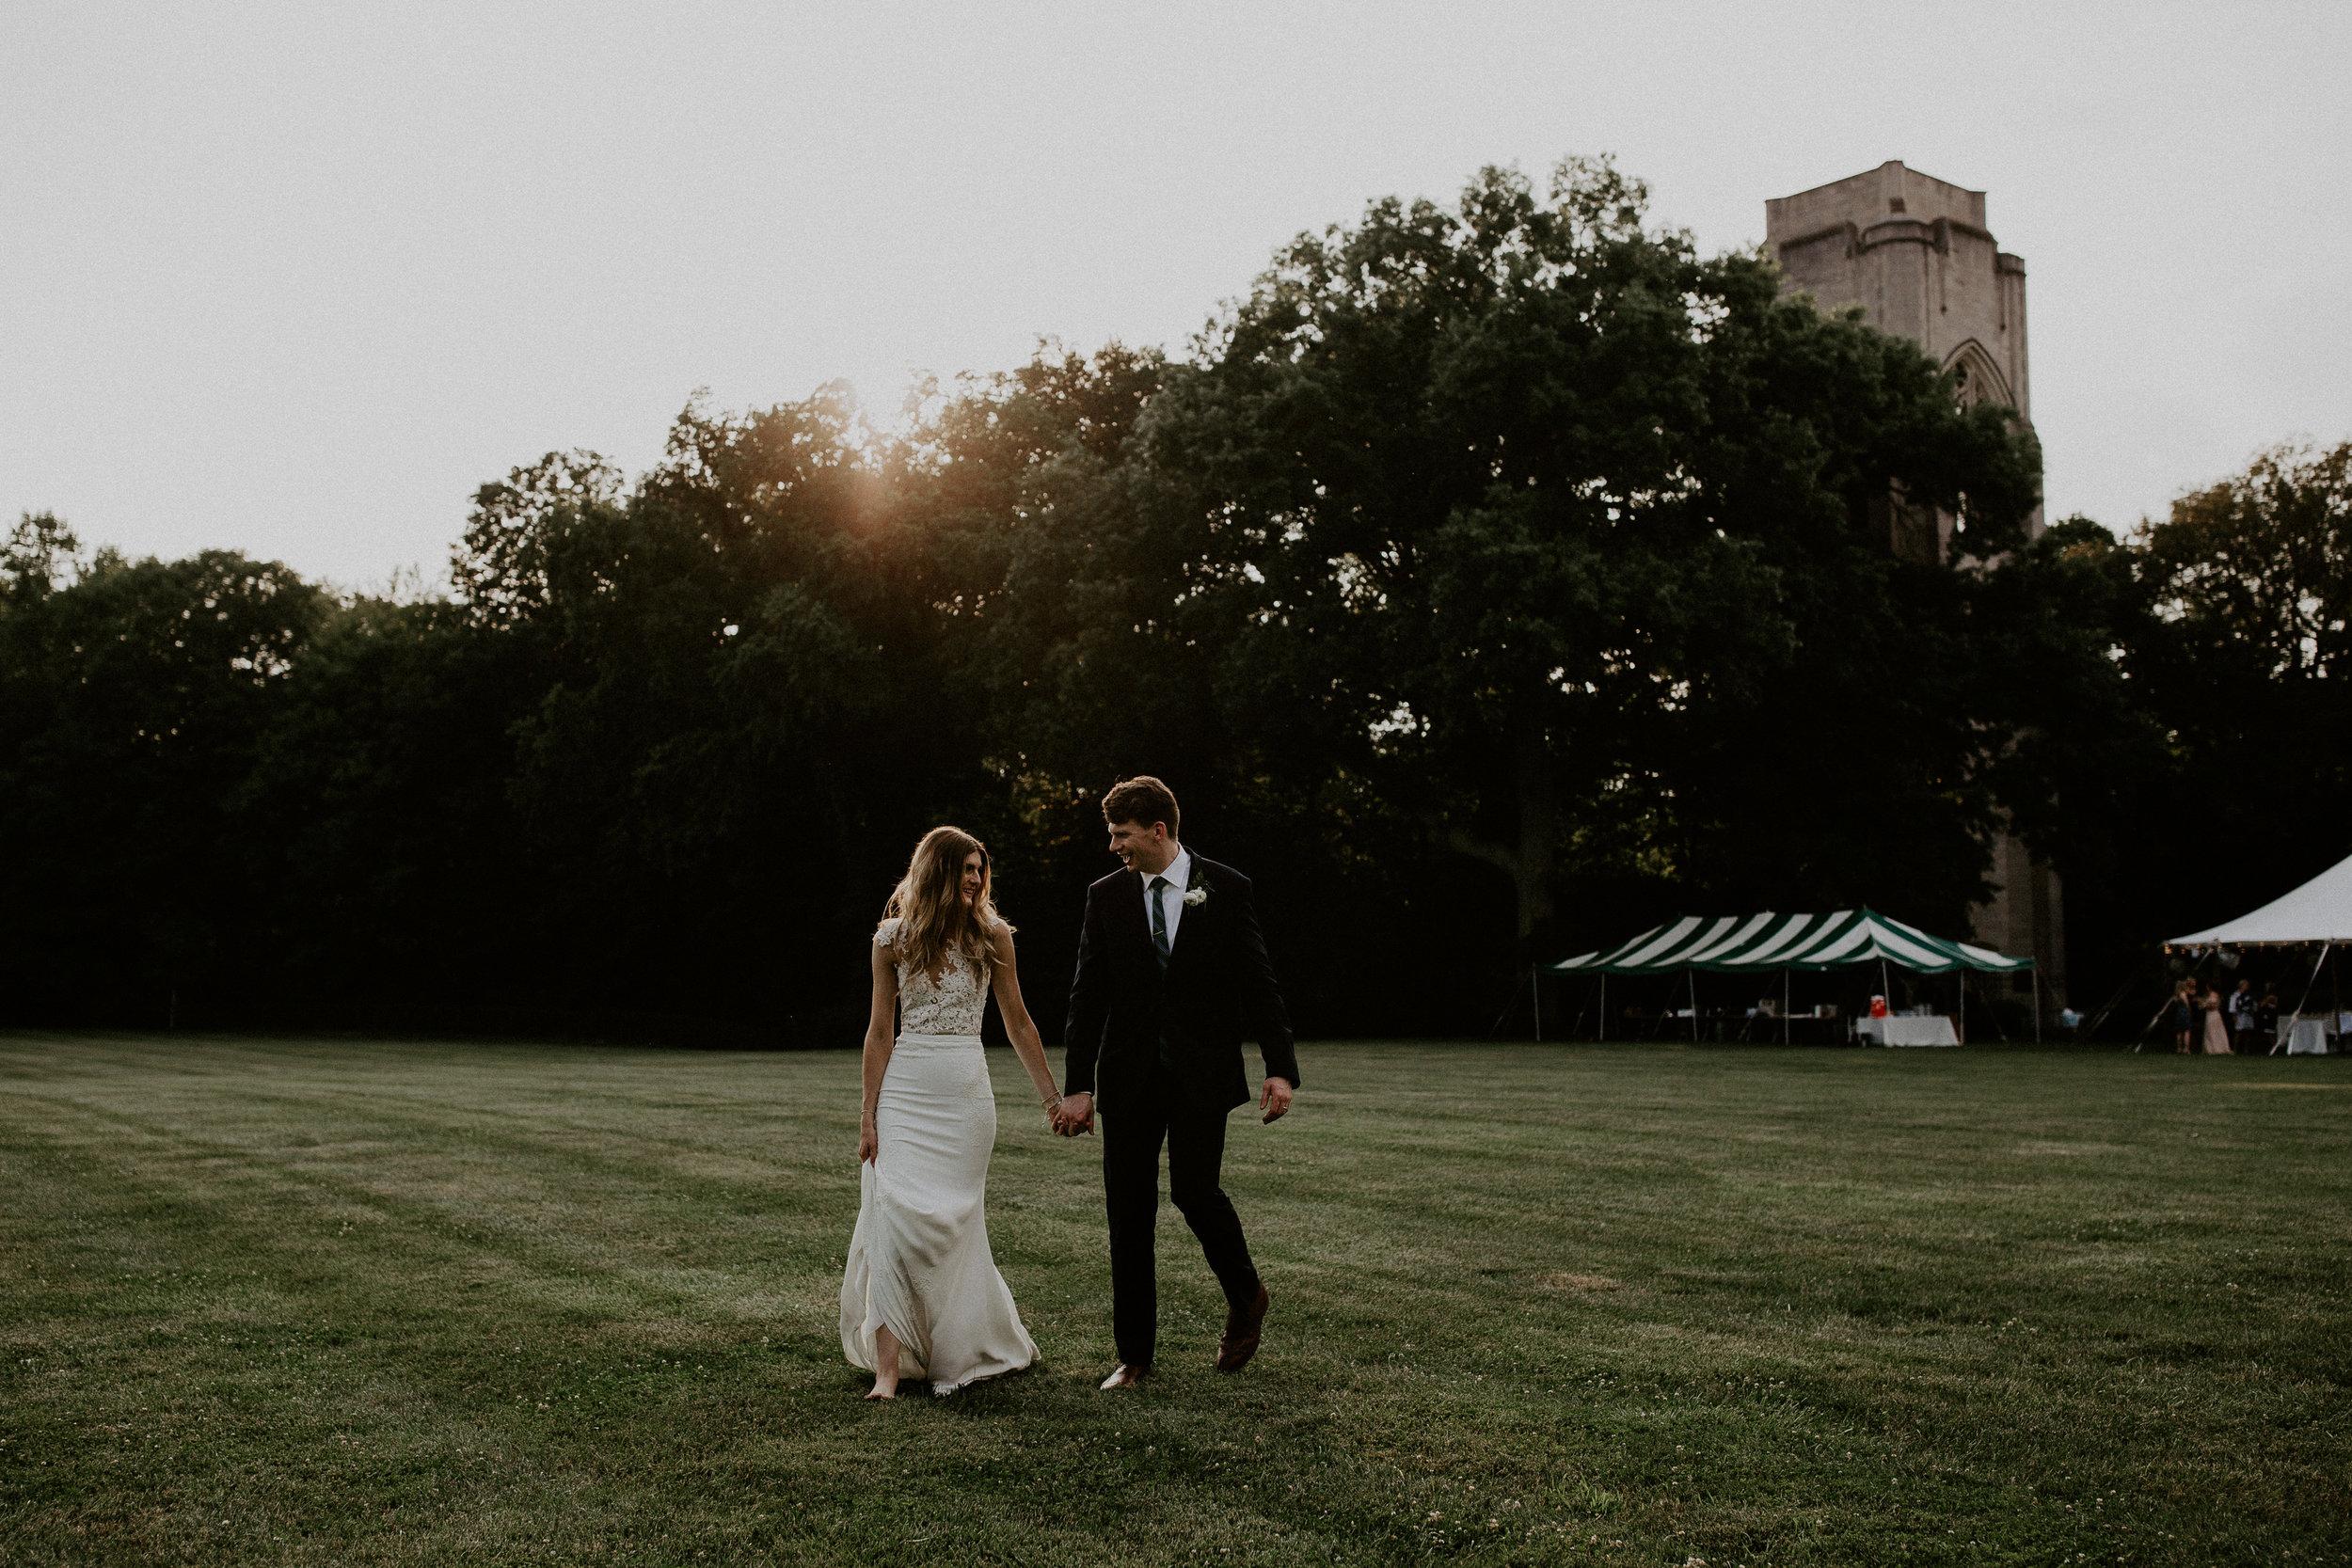 Mariemont_Chapel_Cincinnati_Wedding_Hannah_Nick-EDIT-686.JPG